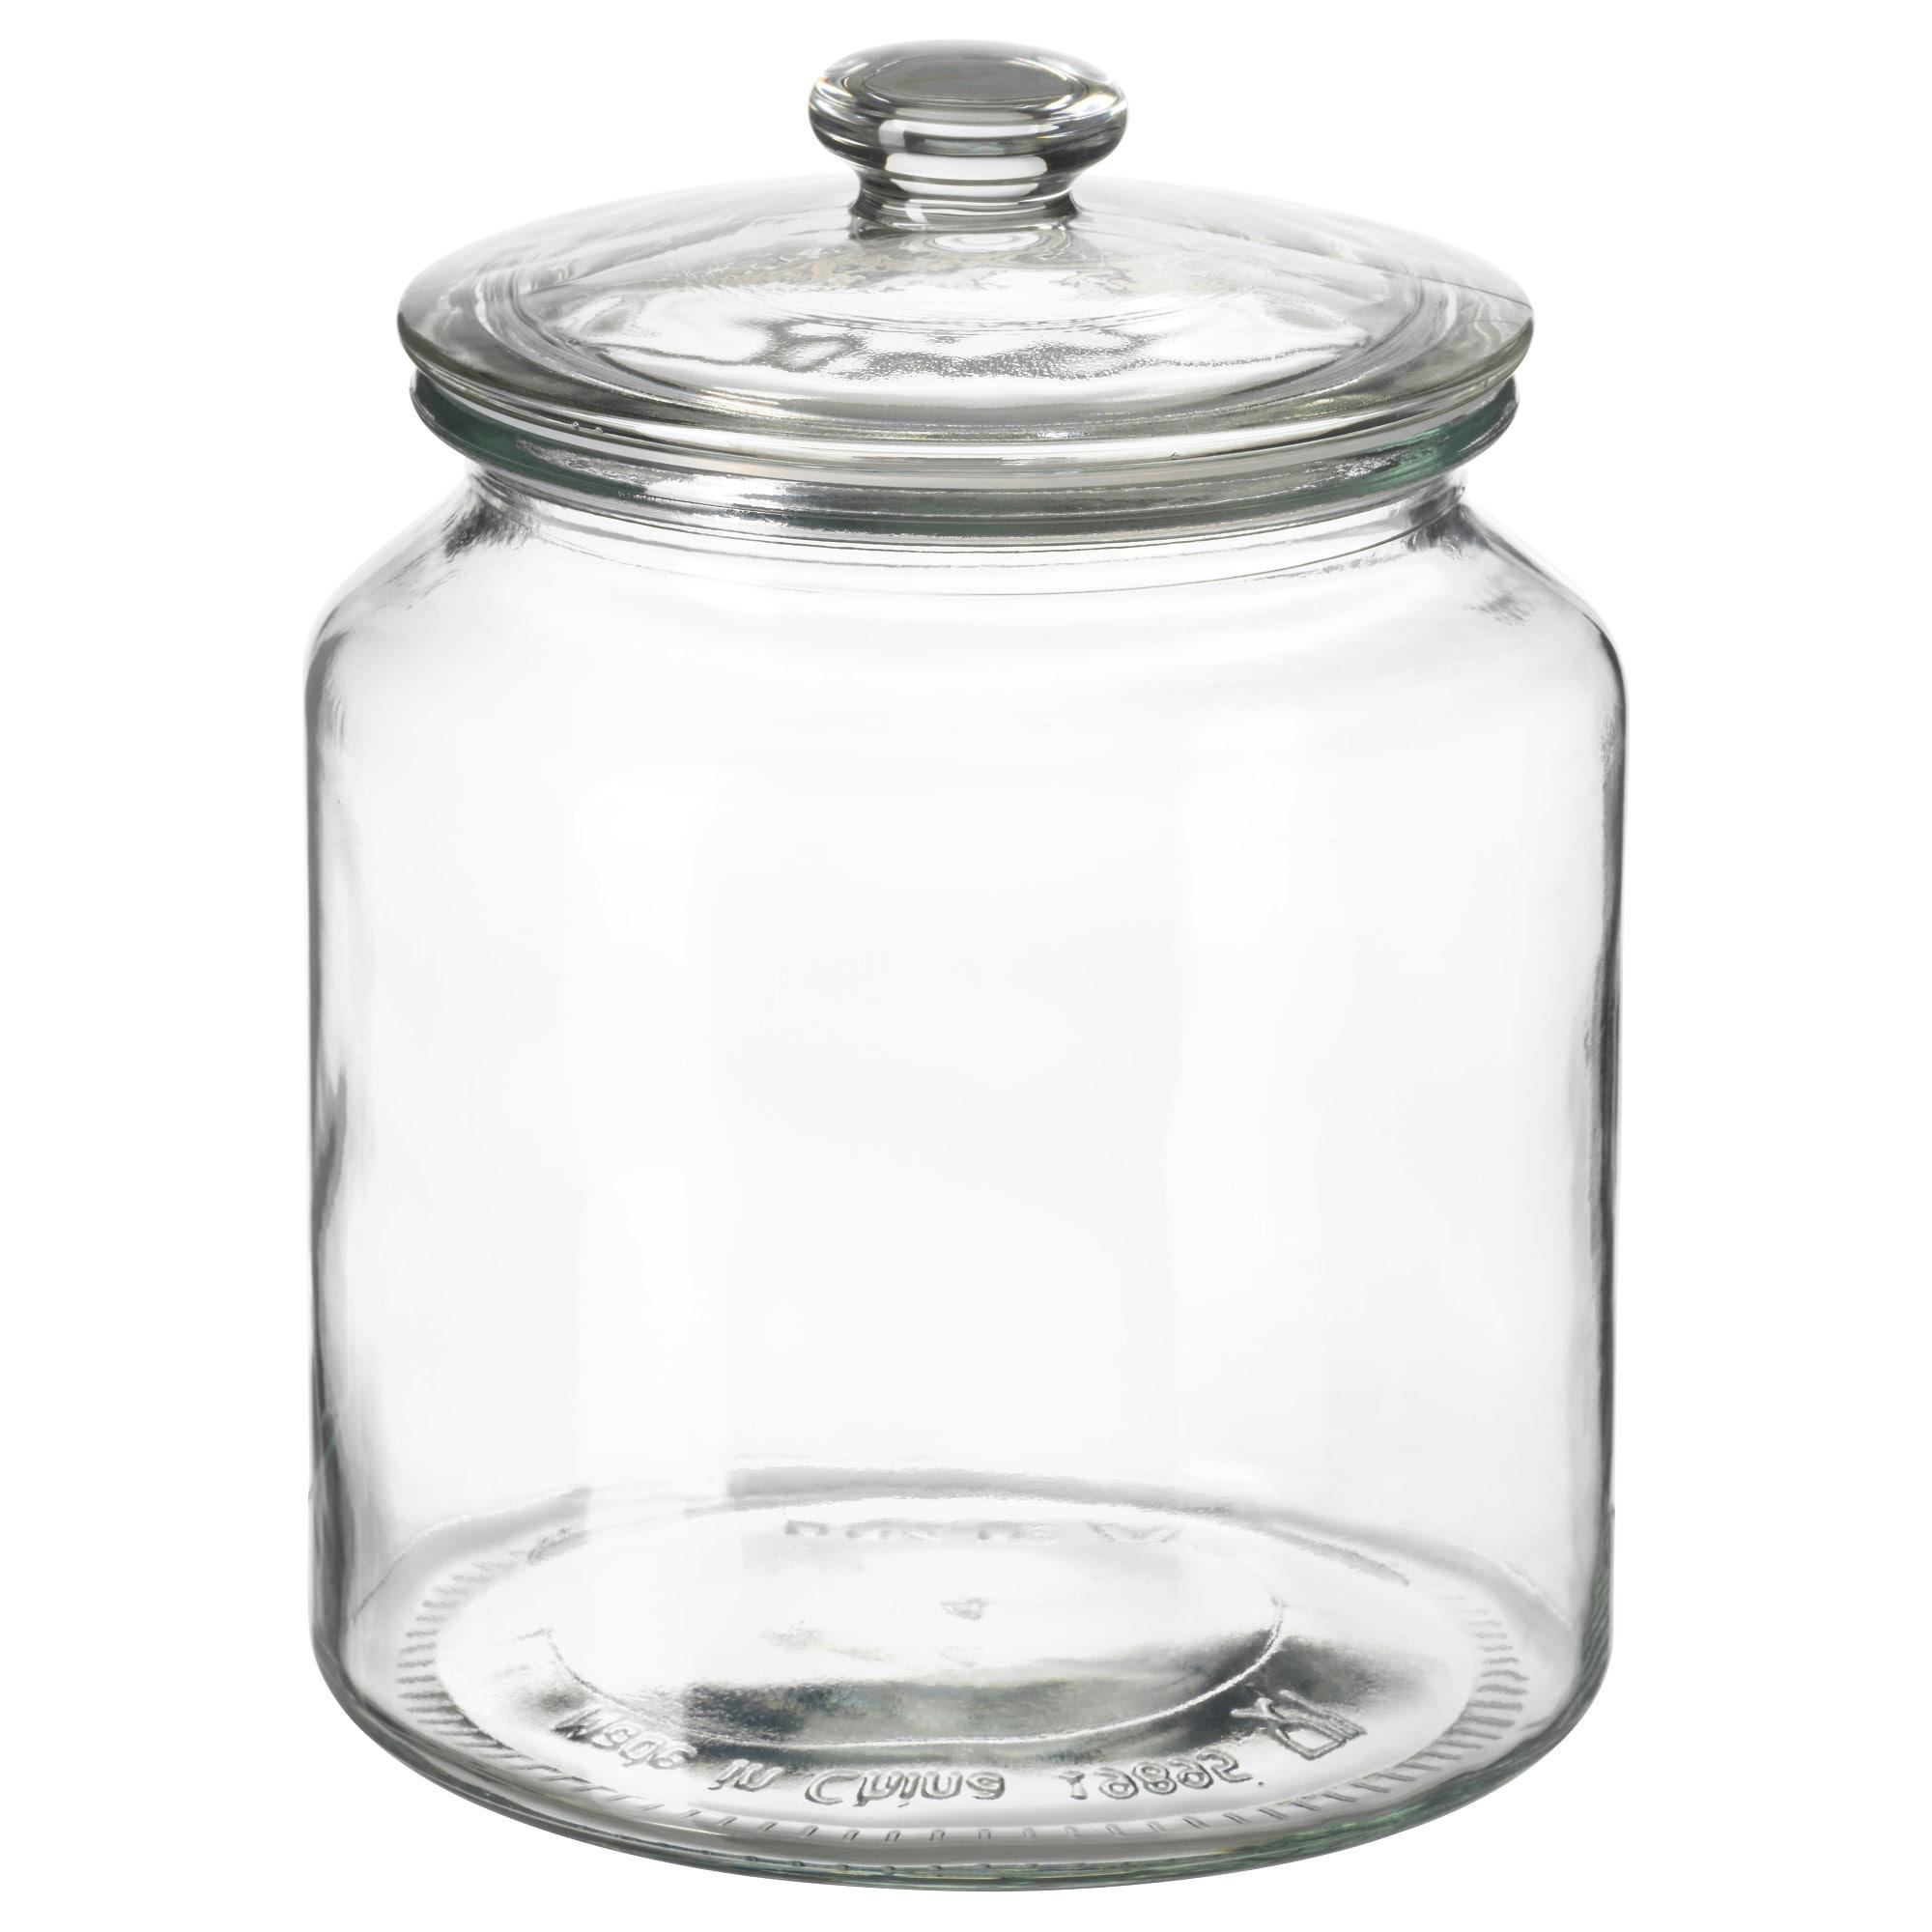 Vardagen Jar With Lid Ikea 5 99 Ikea Jars Kitchen Jars